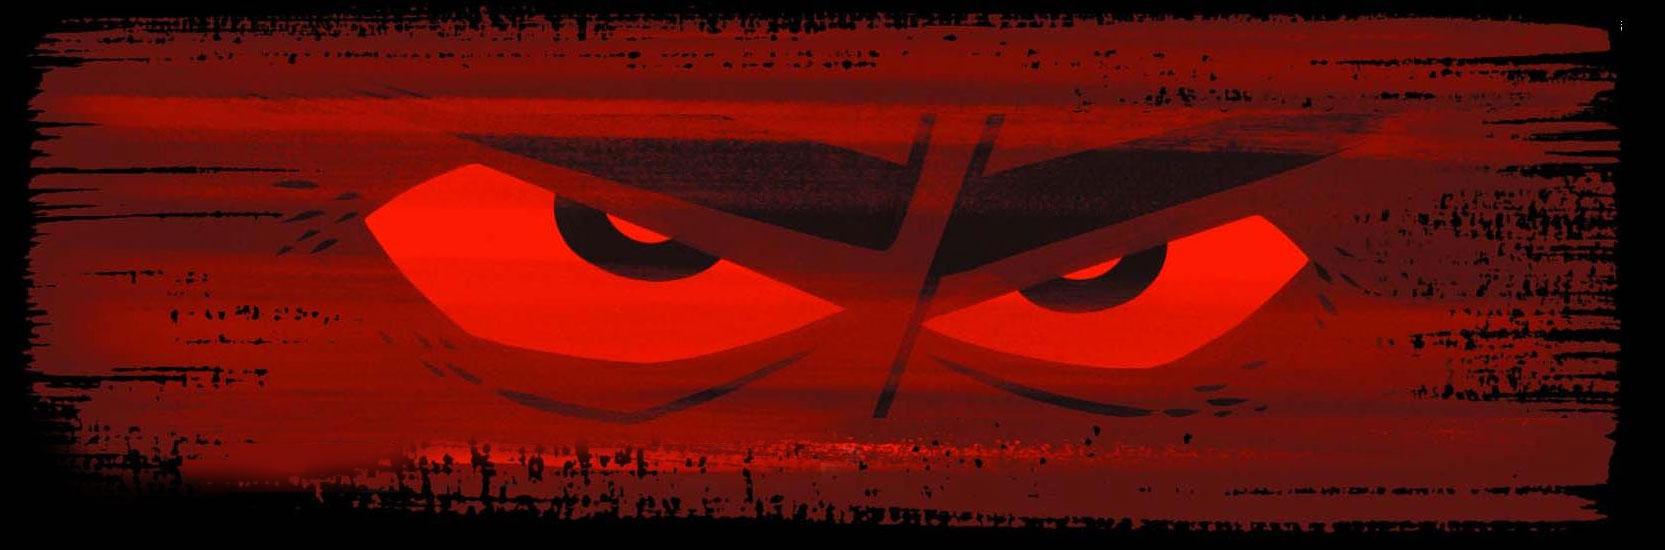 """Samouraï Jack"" de Genndy Tartakovsky de retour en 2016 !"